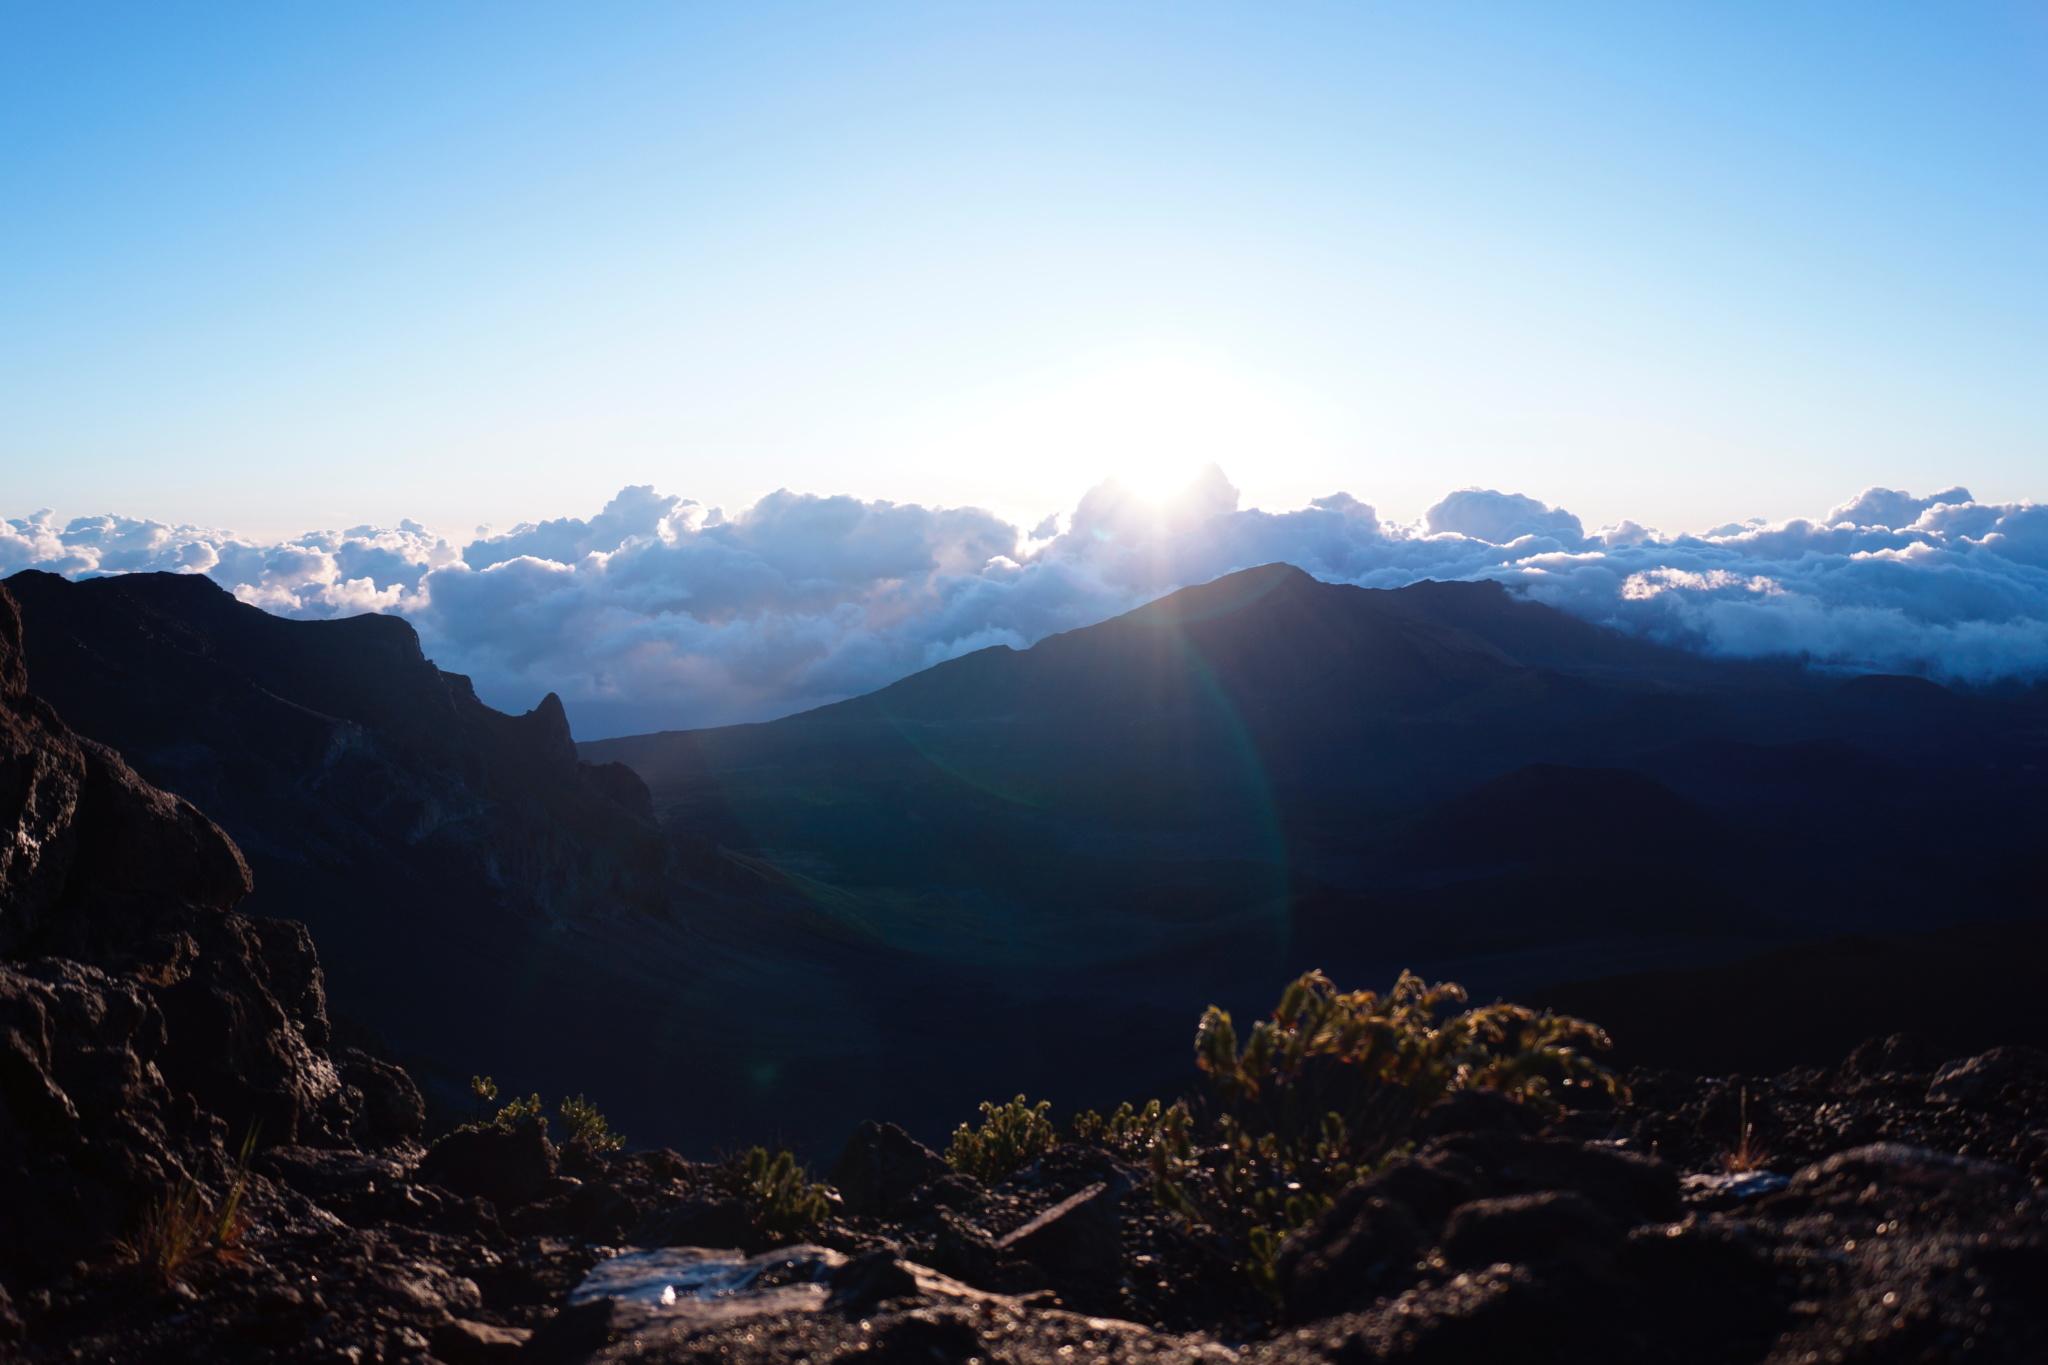 Haleakala Sunrise - Haleakalā Sunrise - Haleakala National Park - Haleakalā National Park - Haleakalā Summit Sunrise - Hawaii - Maui - Summer - Killer Travel - Killer Look Travels - TheKillerLook.com - The Killer Look